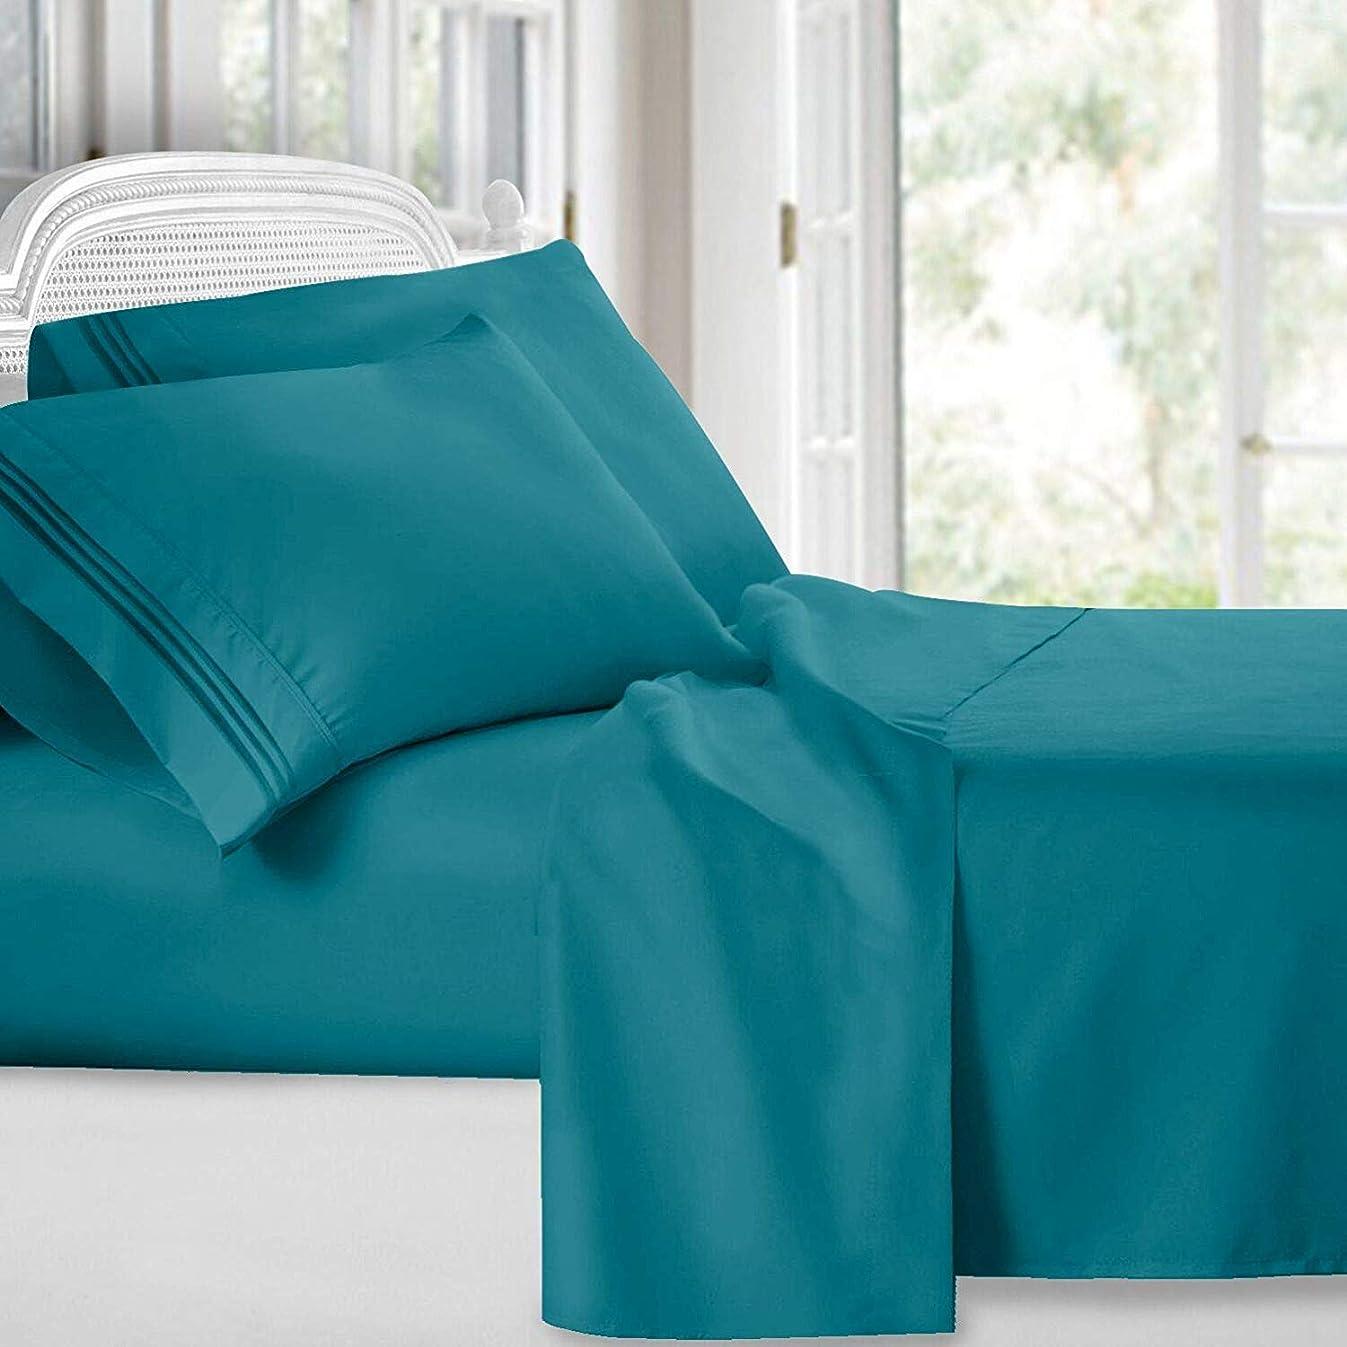 SuperLinen Amazon Original 550 ThreadCount 1 Piece Flat Sheet Queen Teal Solid 100% Egyptian Cotton